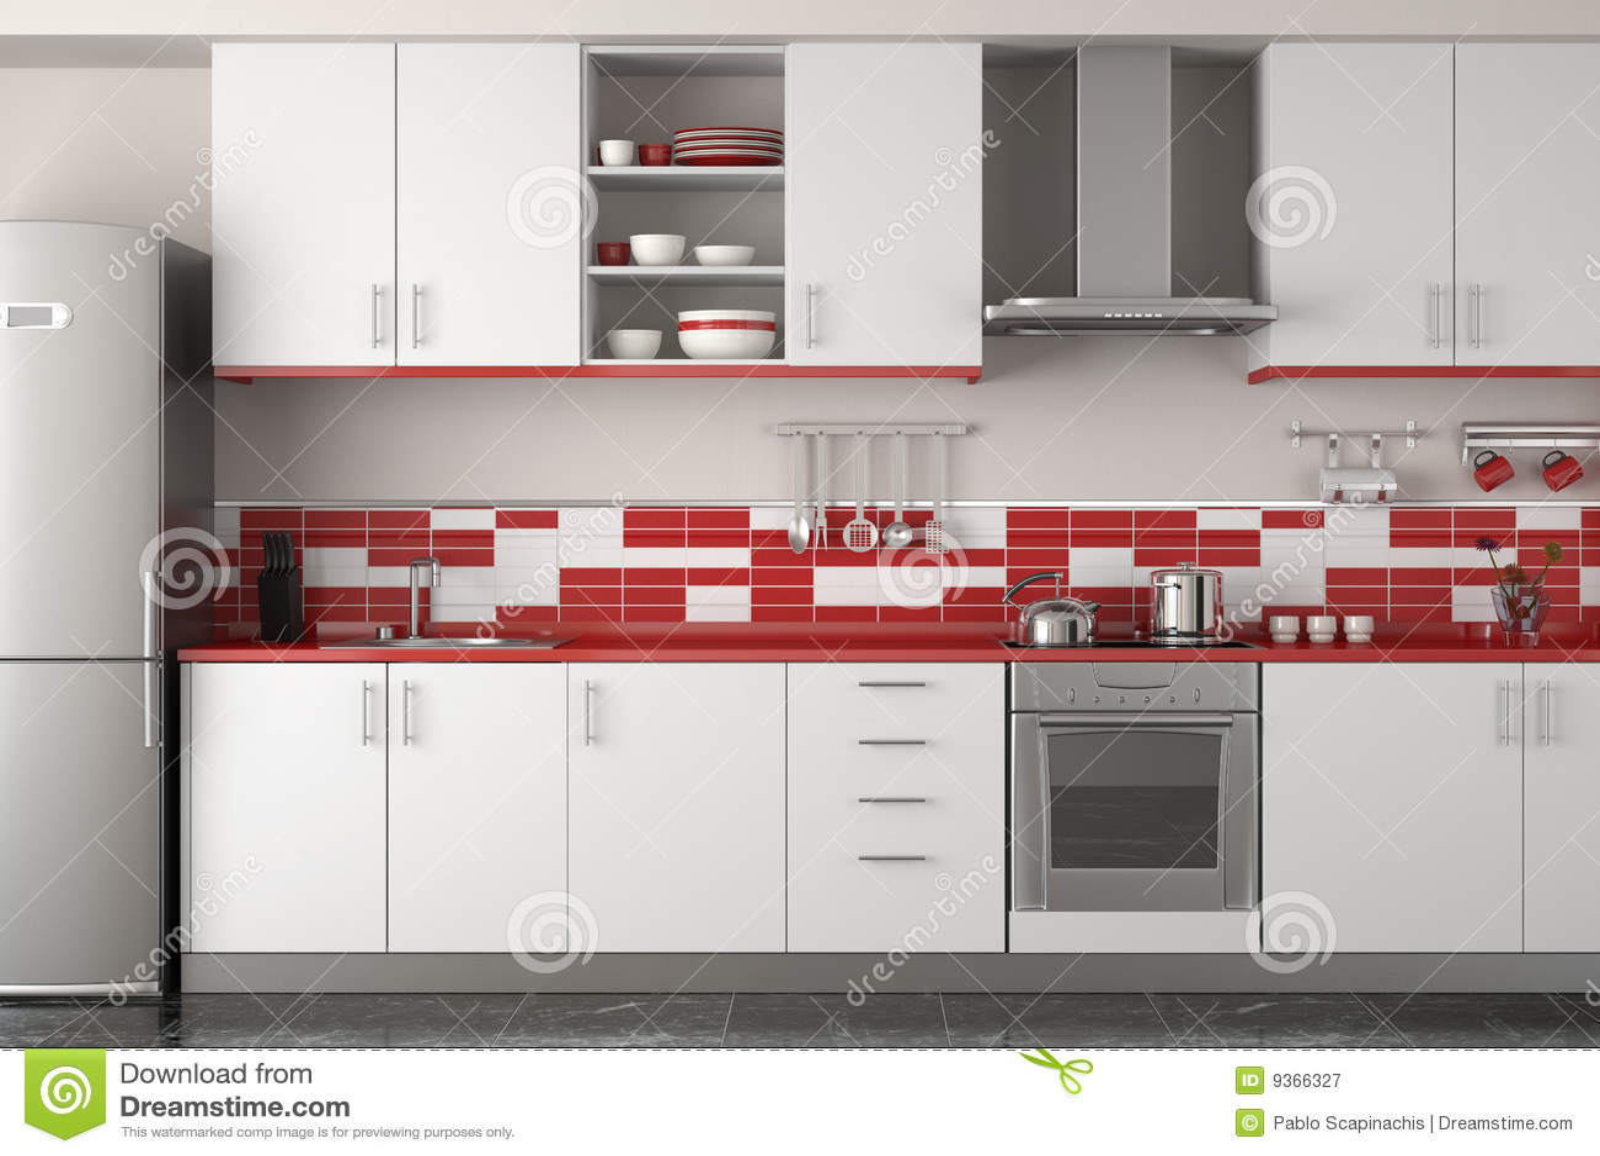 Diseno Interior De Cocina Roja Moderna Stock De Ilustracion